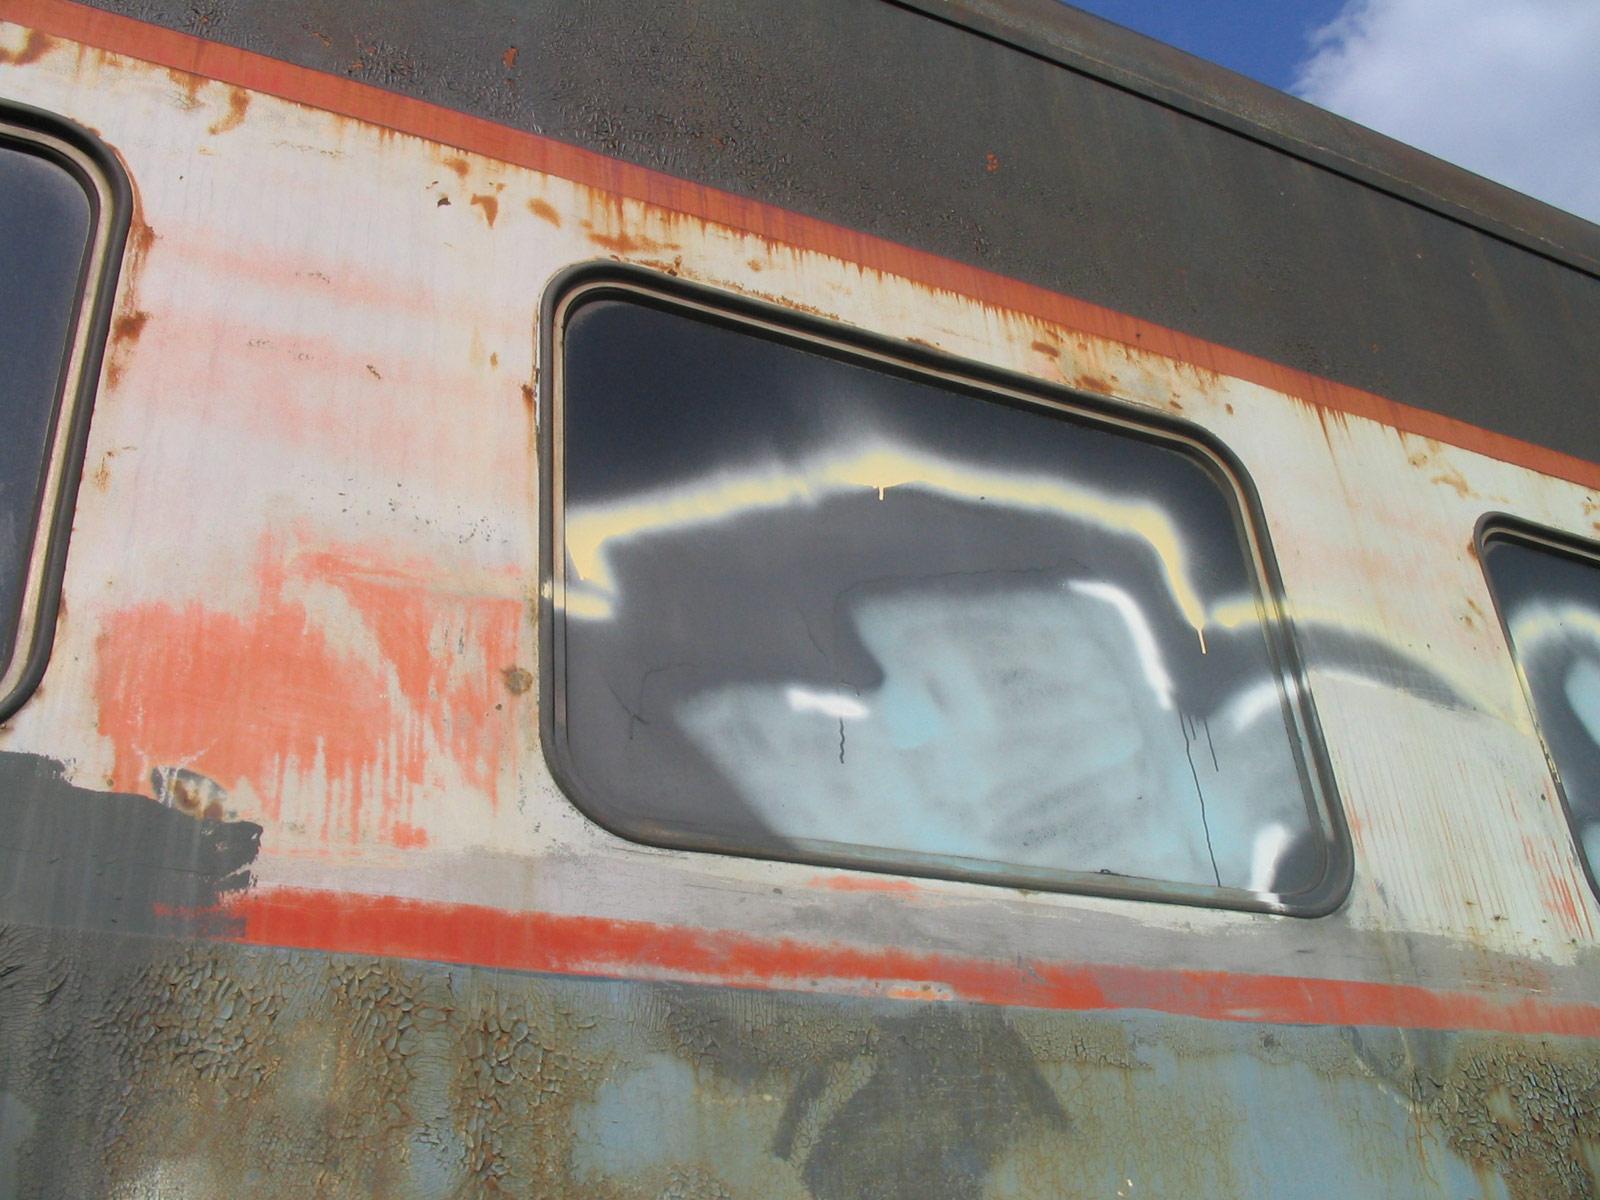 nicolaswill train wreck old binned graffiti windows spray abandoned hi-res